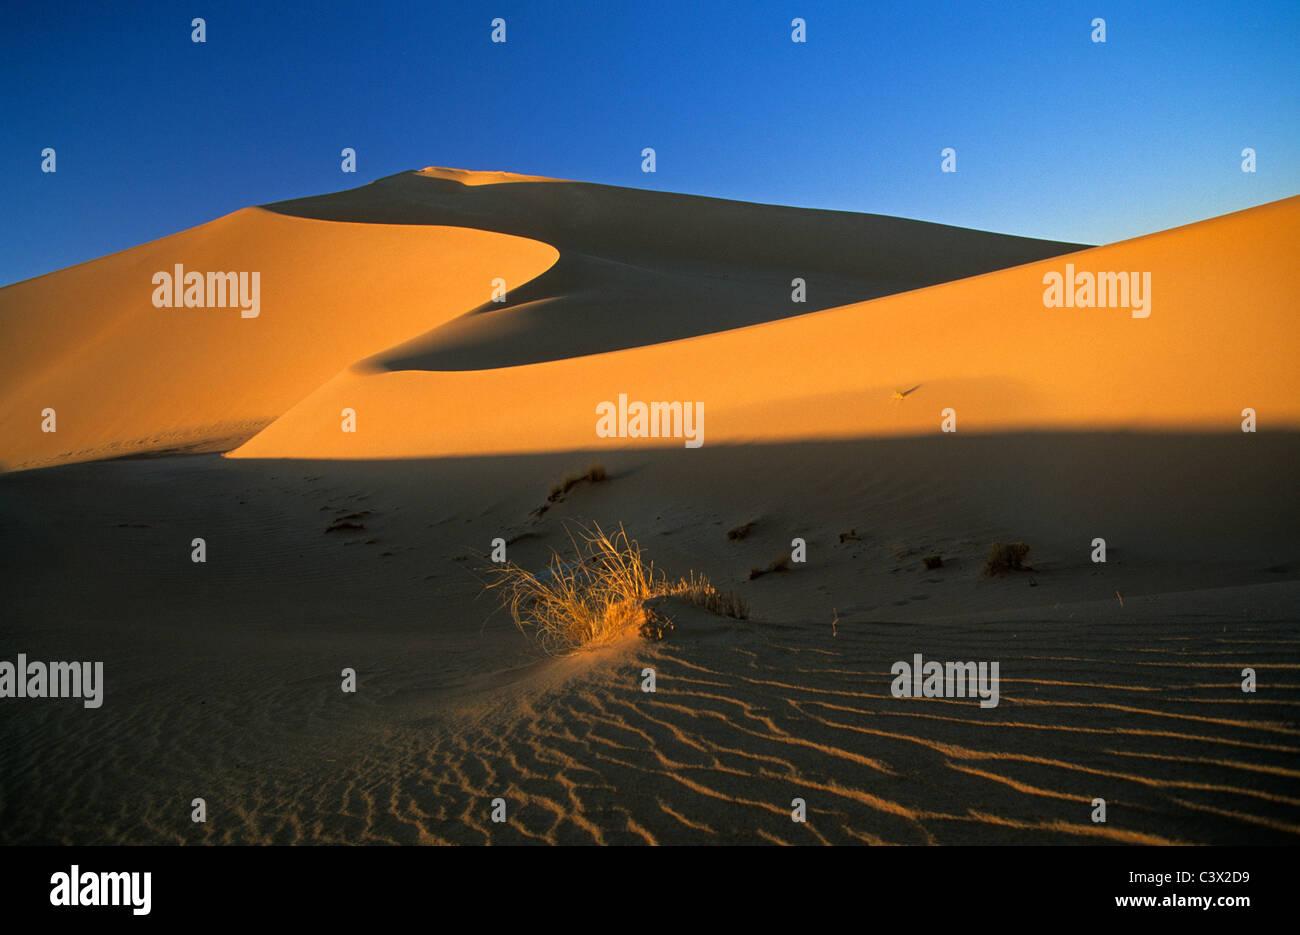 Algeria, Djanet, Sahara dessert, piante sopravvissute in sabbia. Le dune di sabbia. Immagini Stock